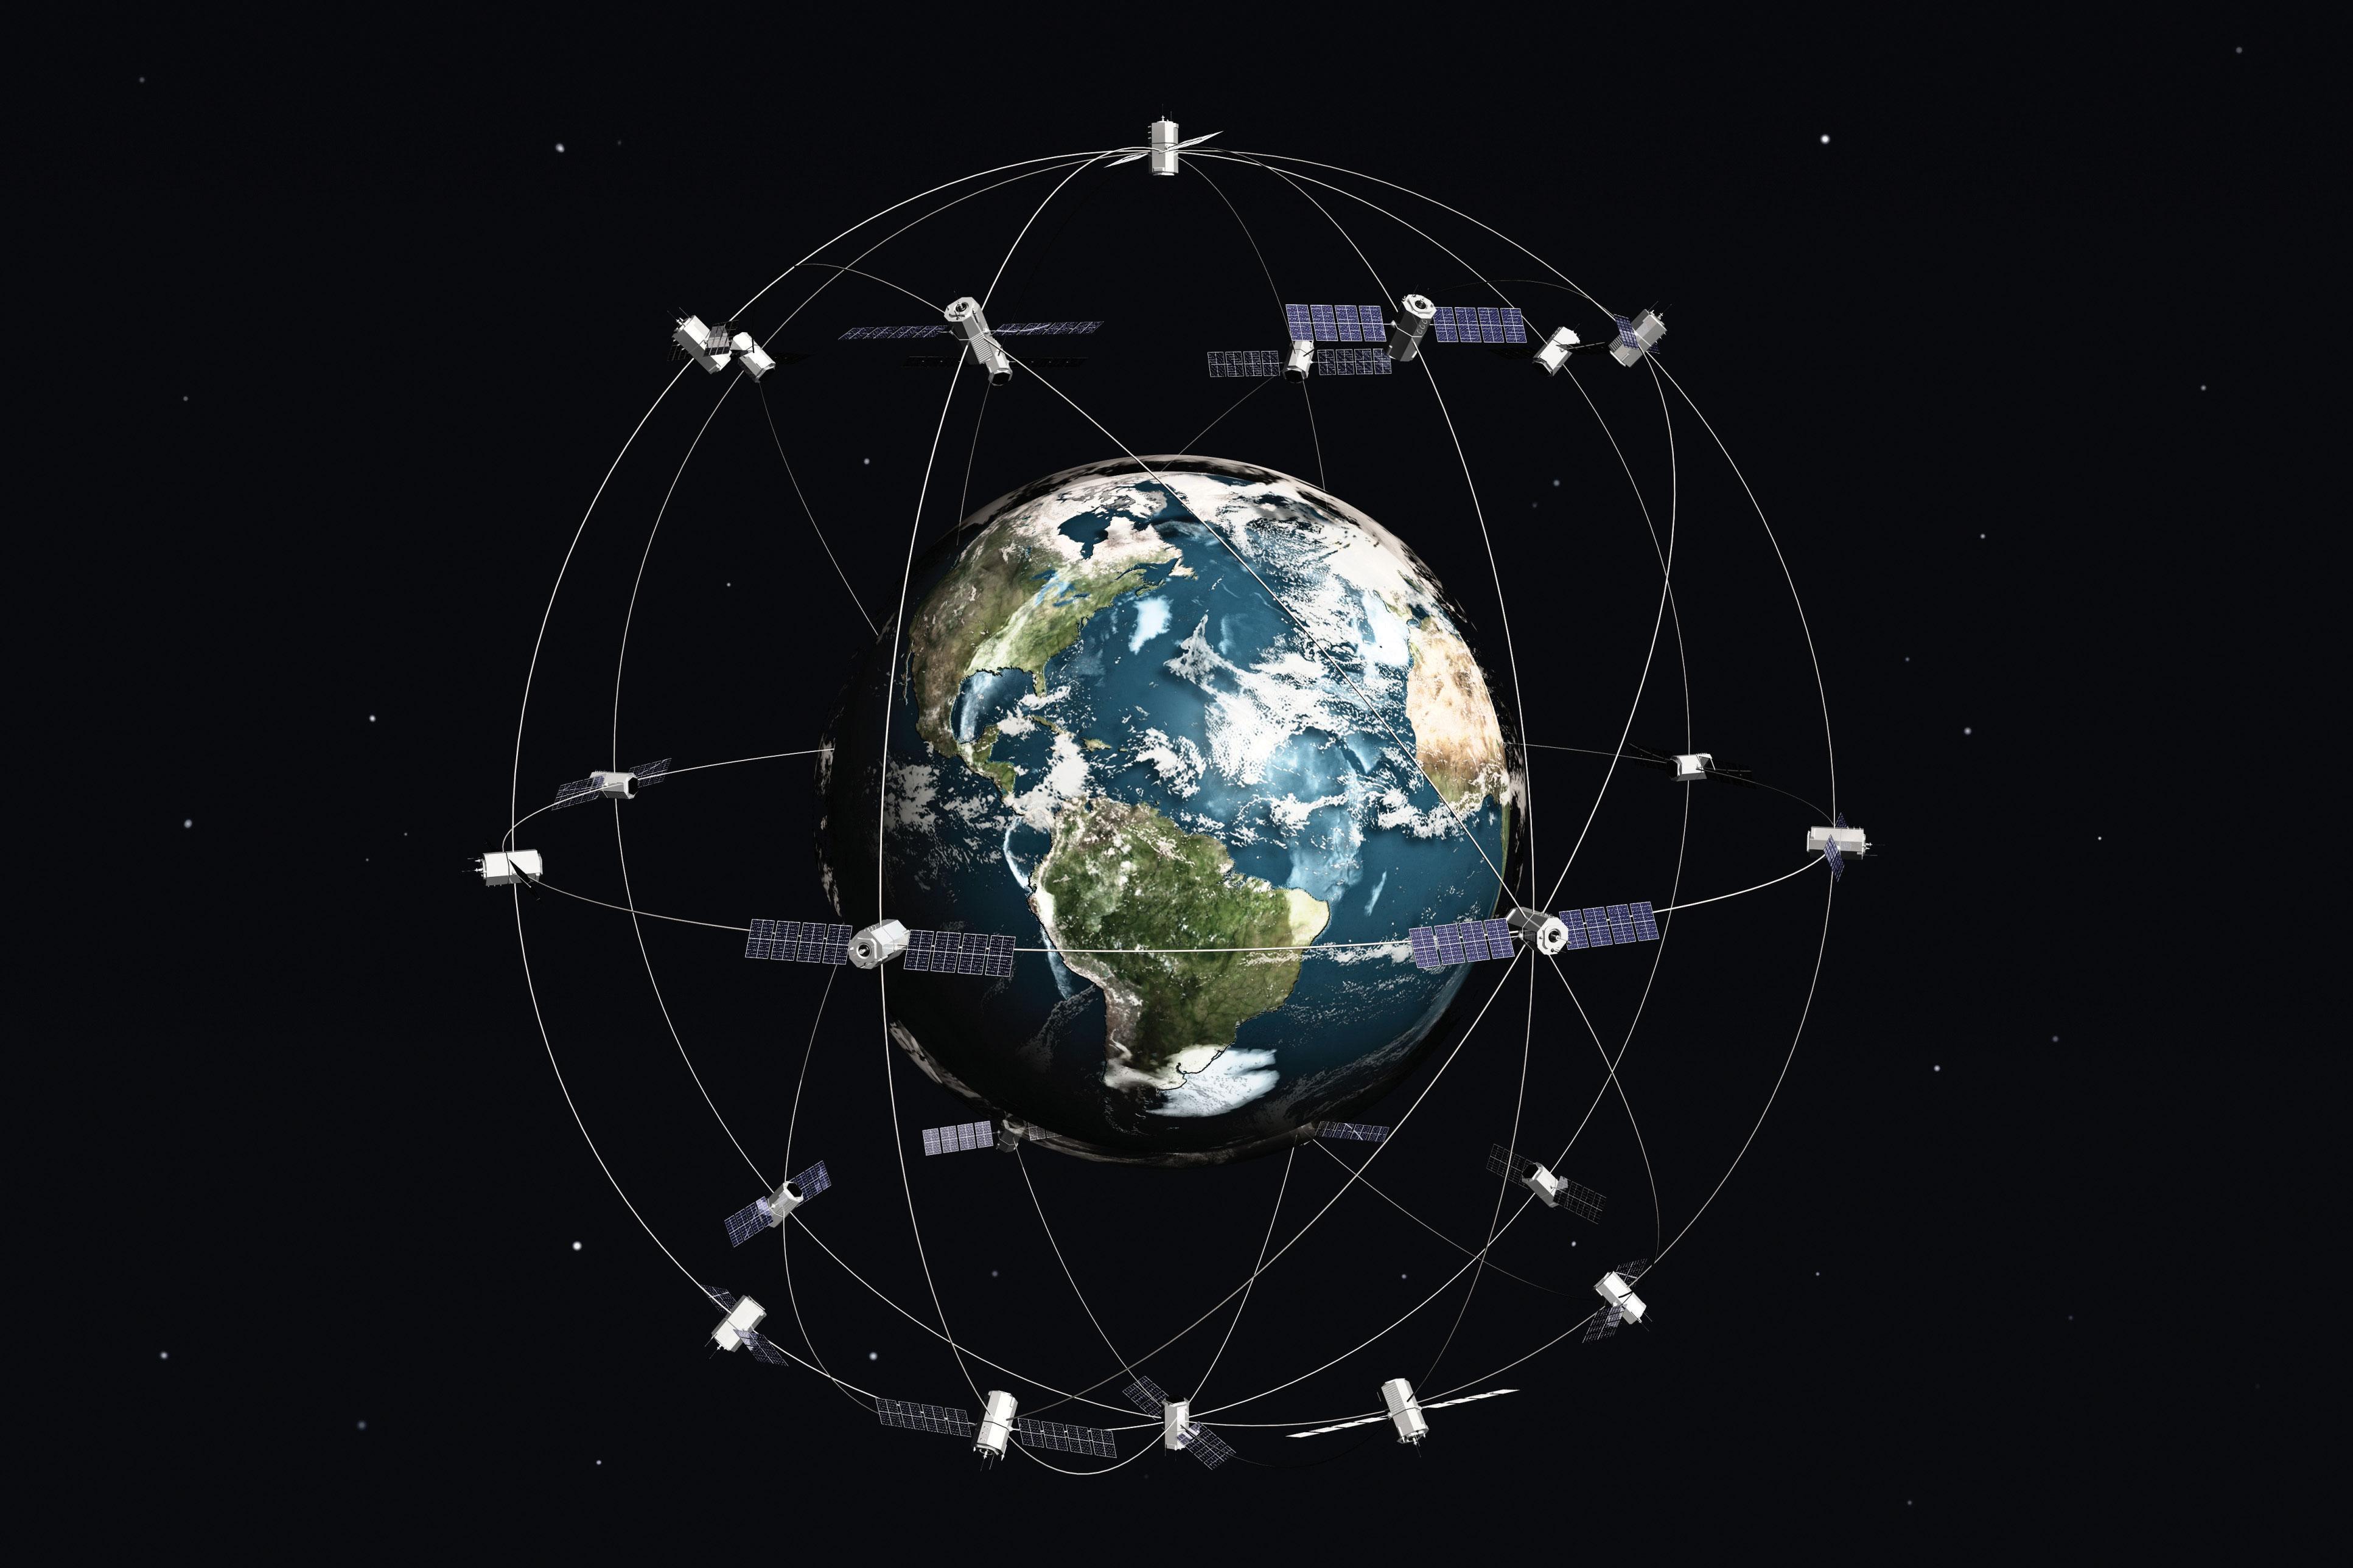 flat earth nasa satellite - photo #33